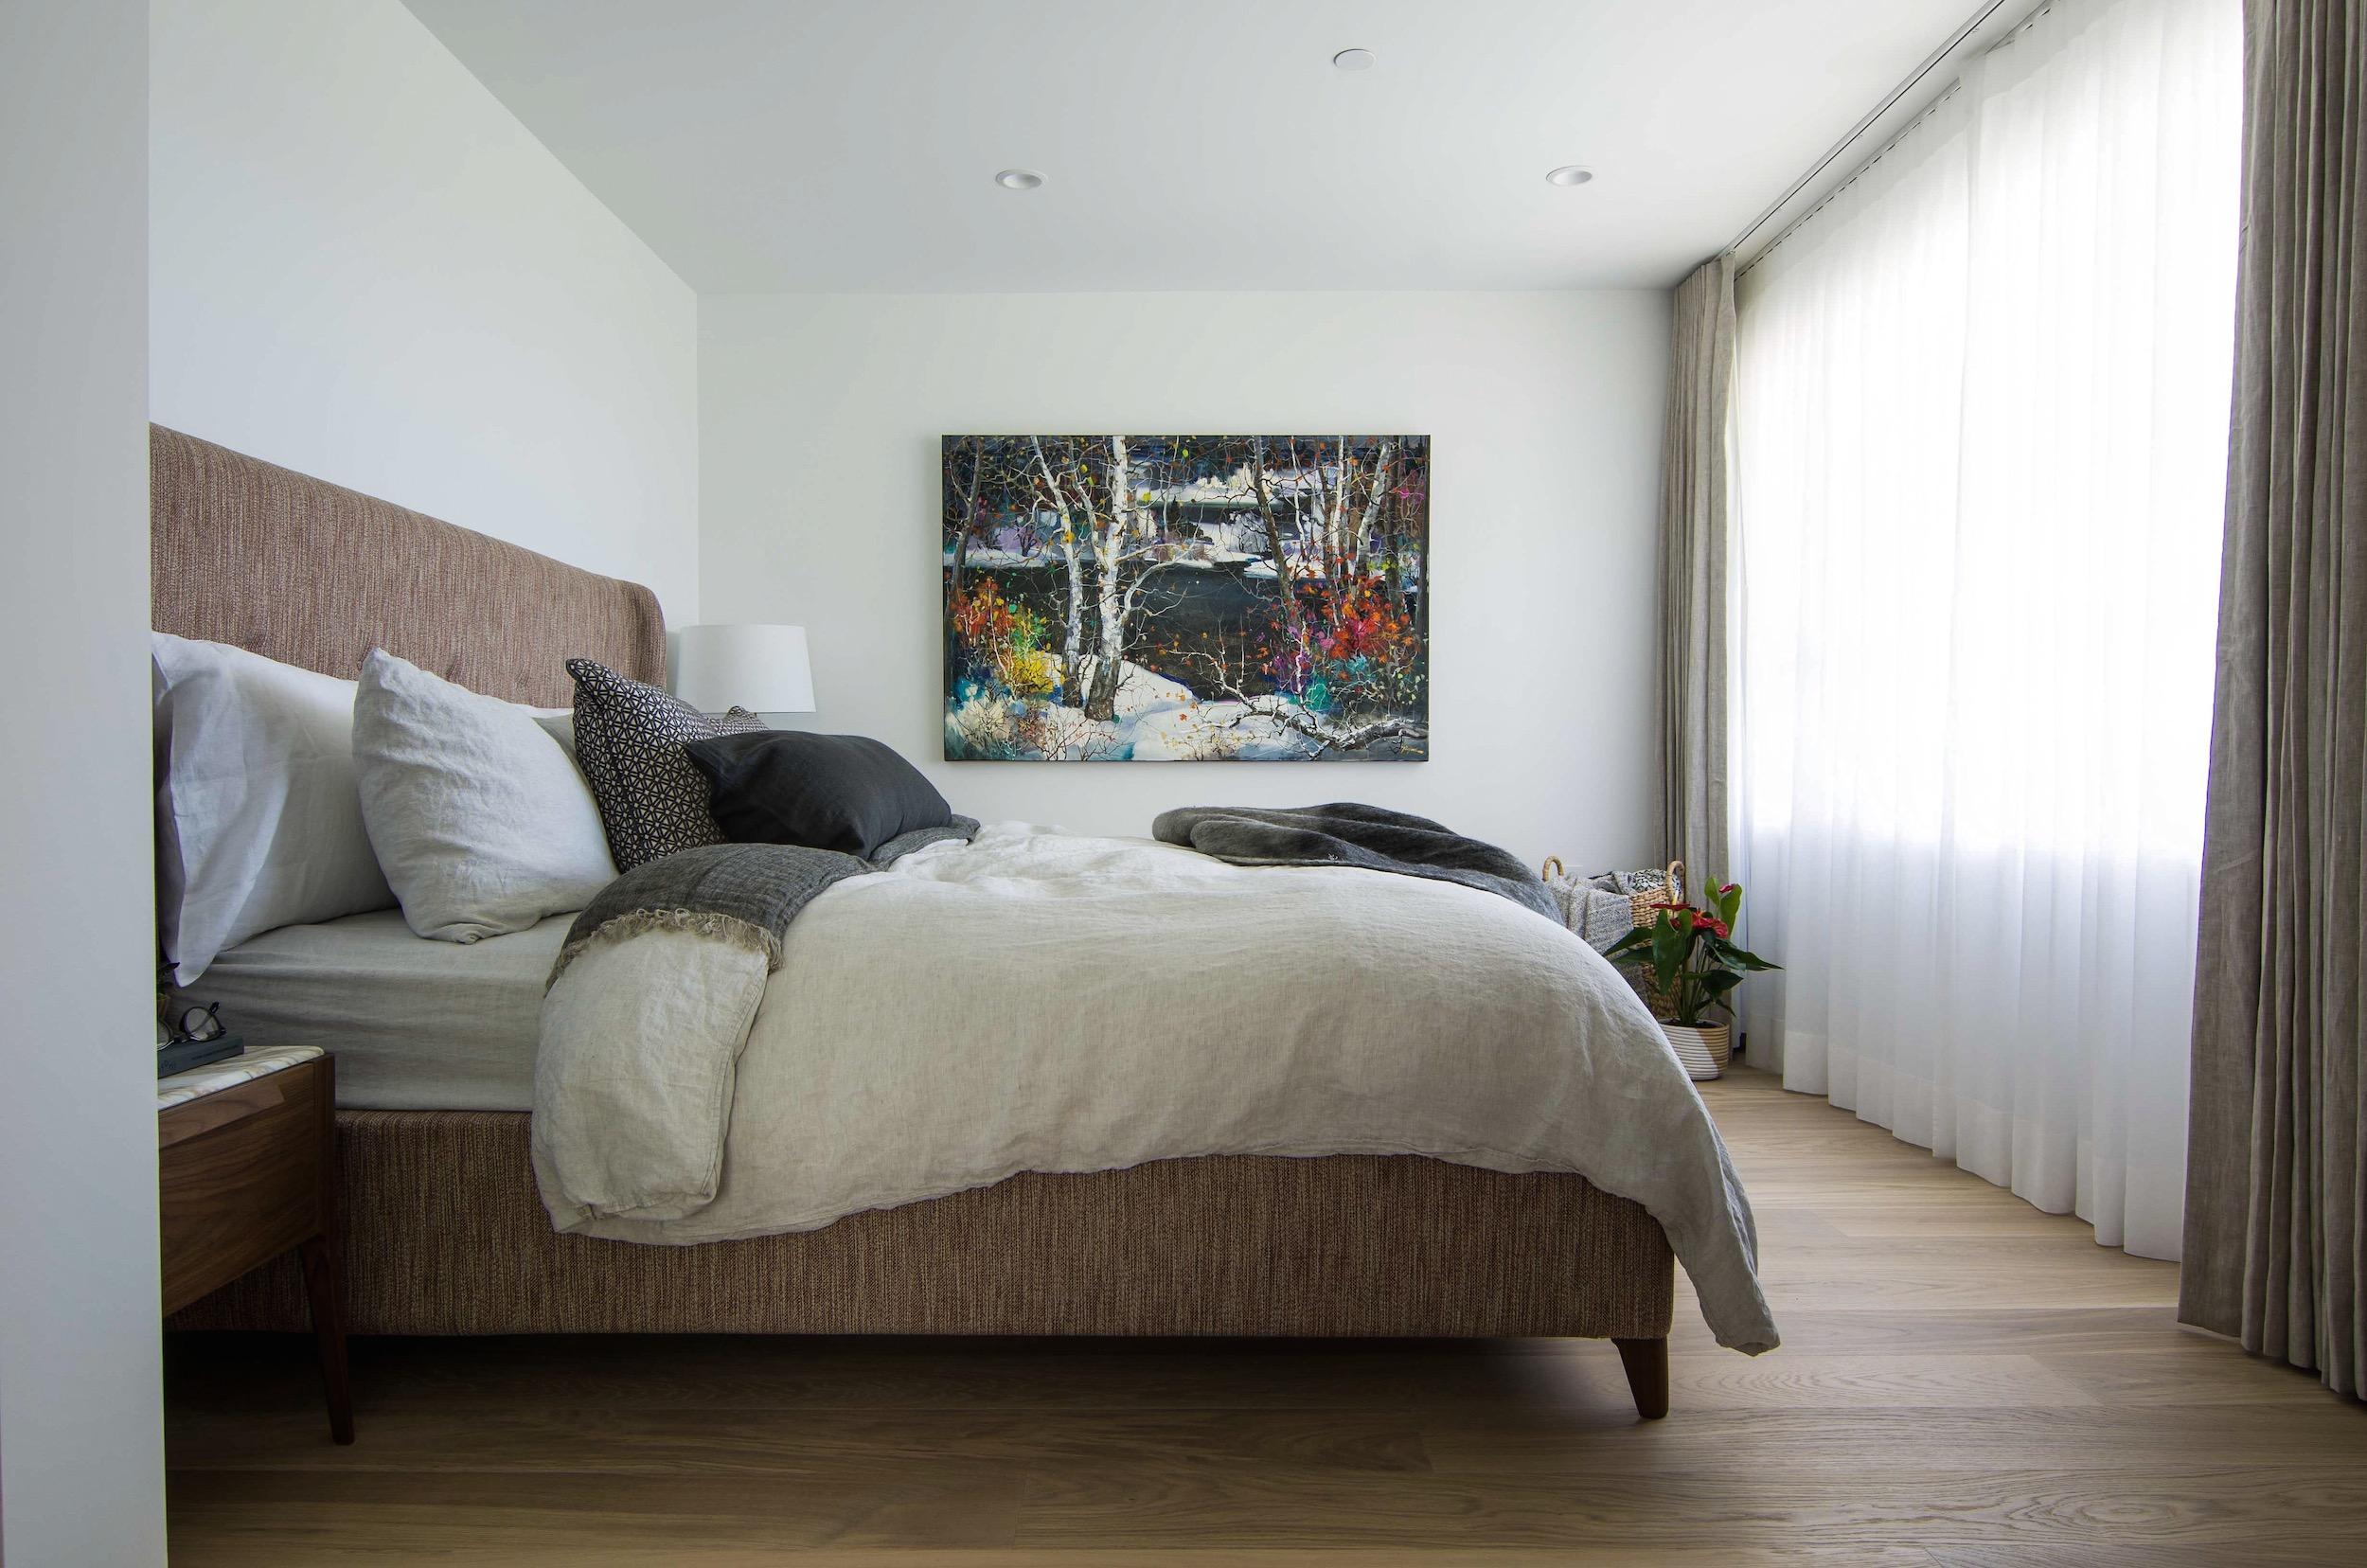 KRC_Spyglass_Master_Bedroom_Custom_Bed.JPG.JPG